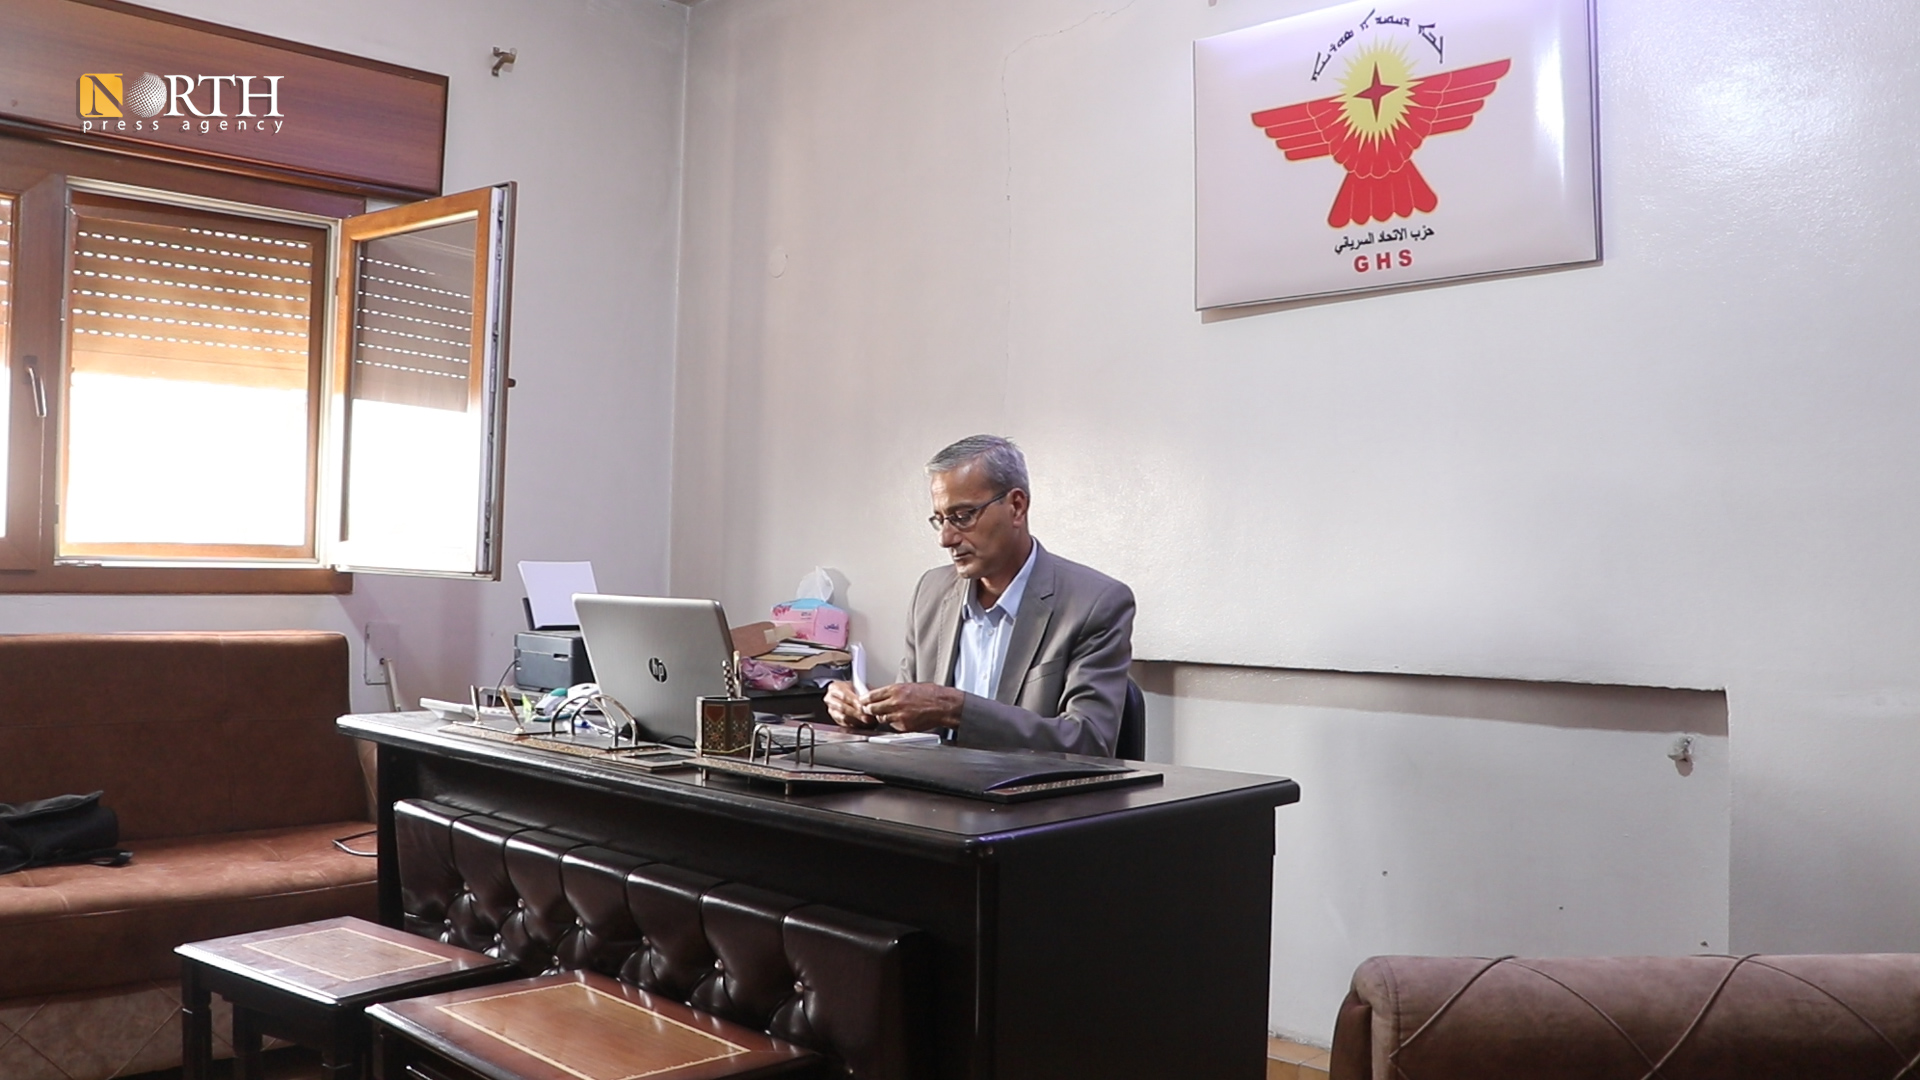 Sanharib Barsom, co-chair of the Syriac Union Party – North Press